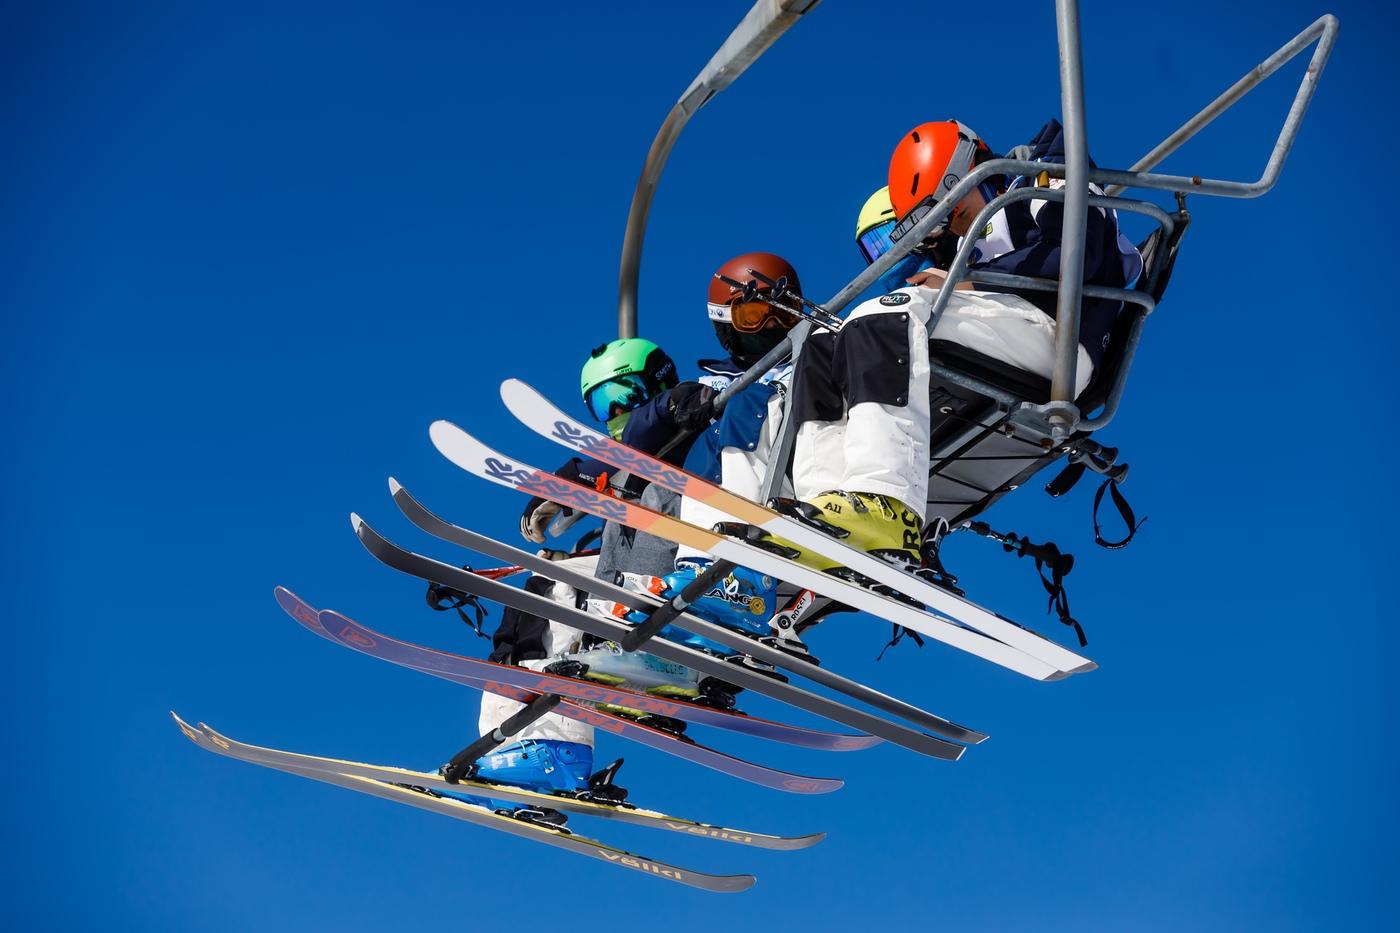 WinterKids Downhill 24 2021 SDP 3145